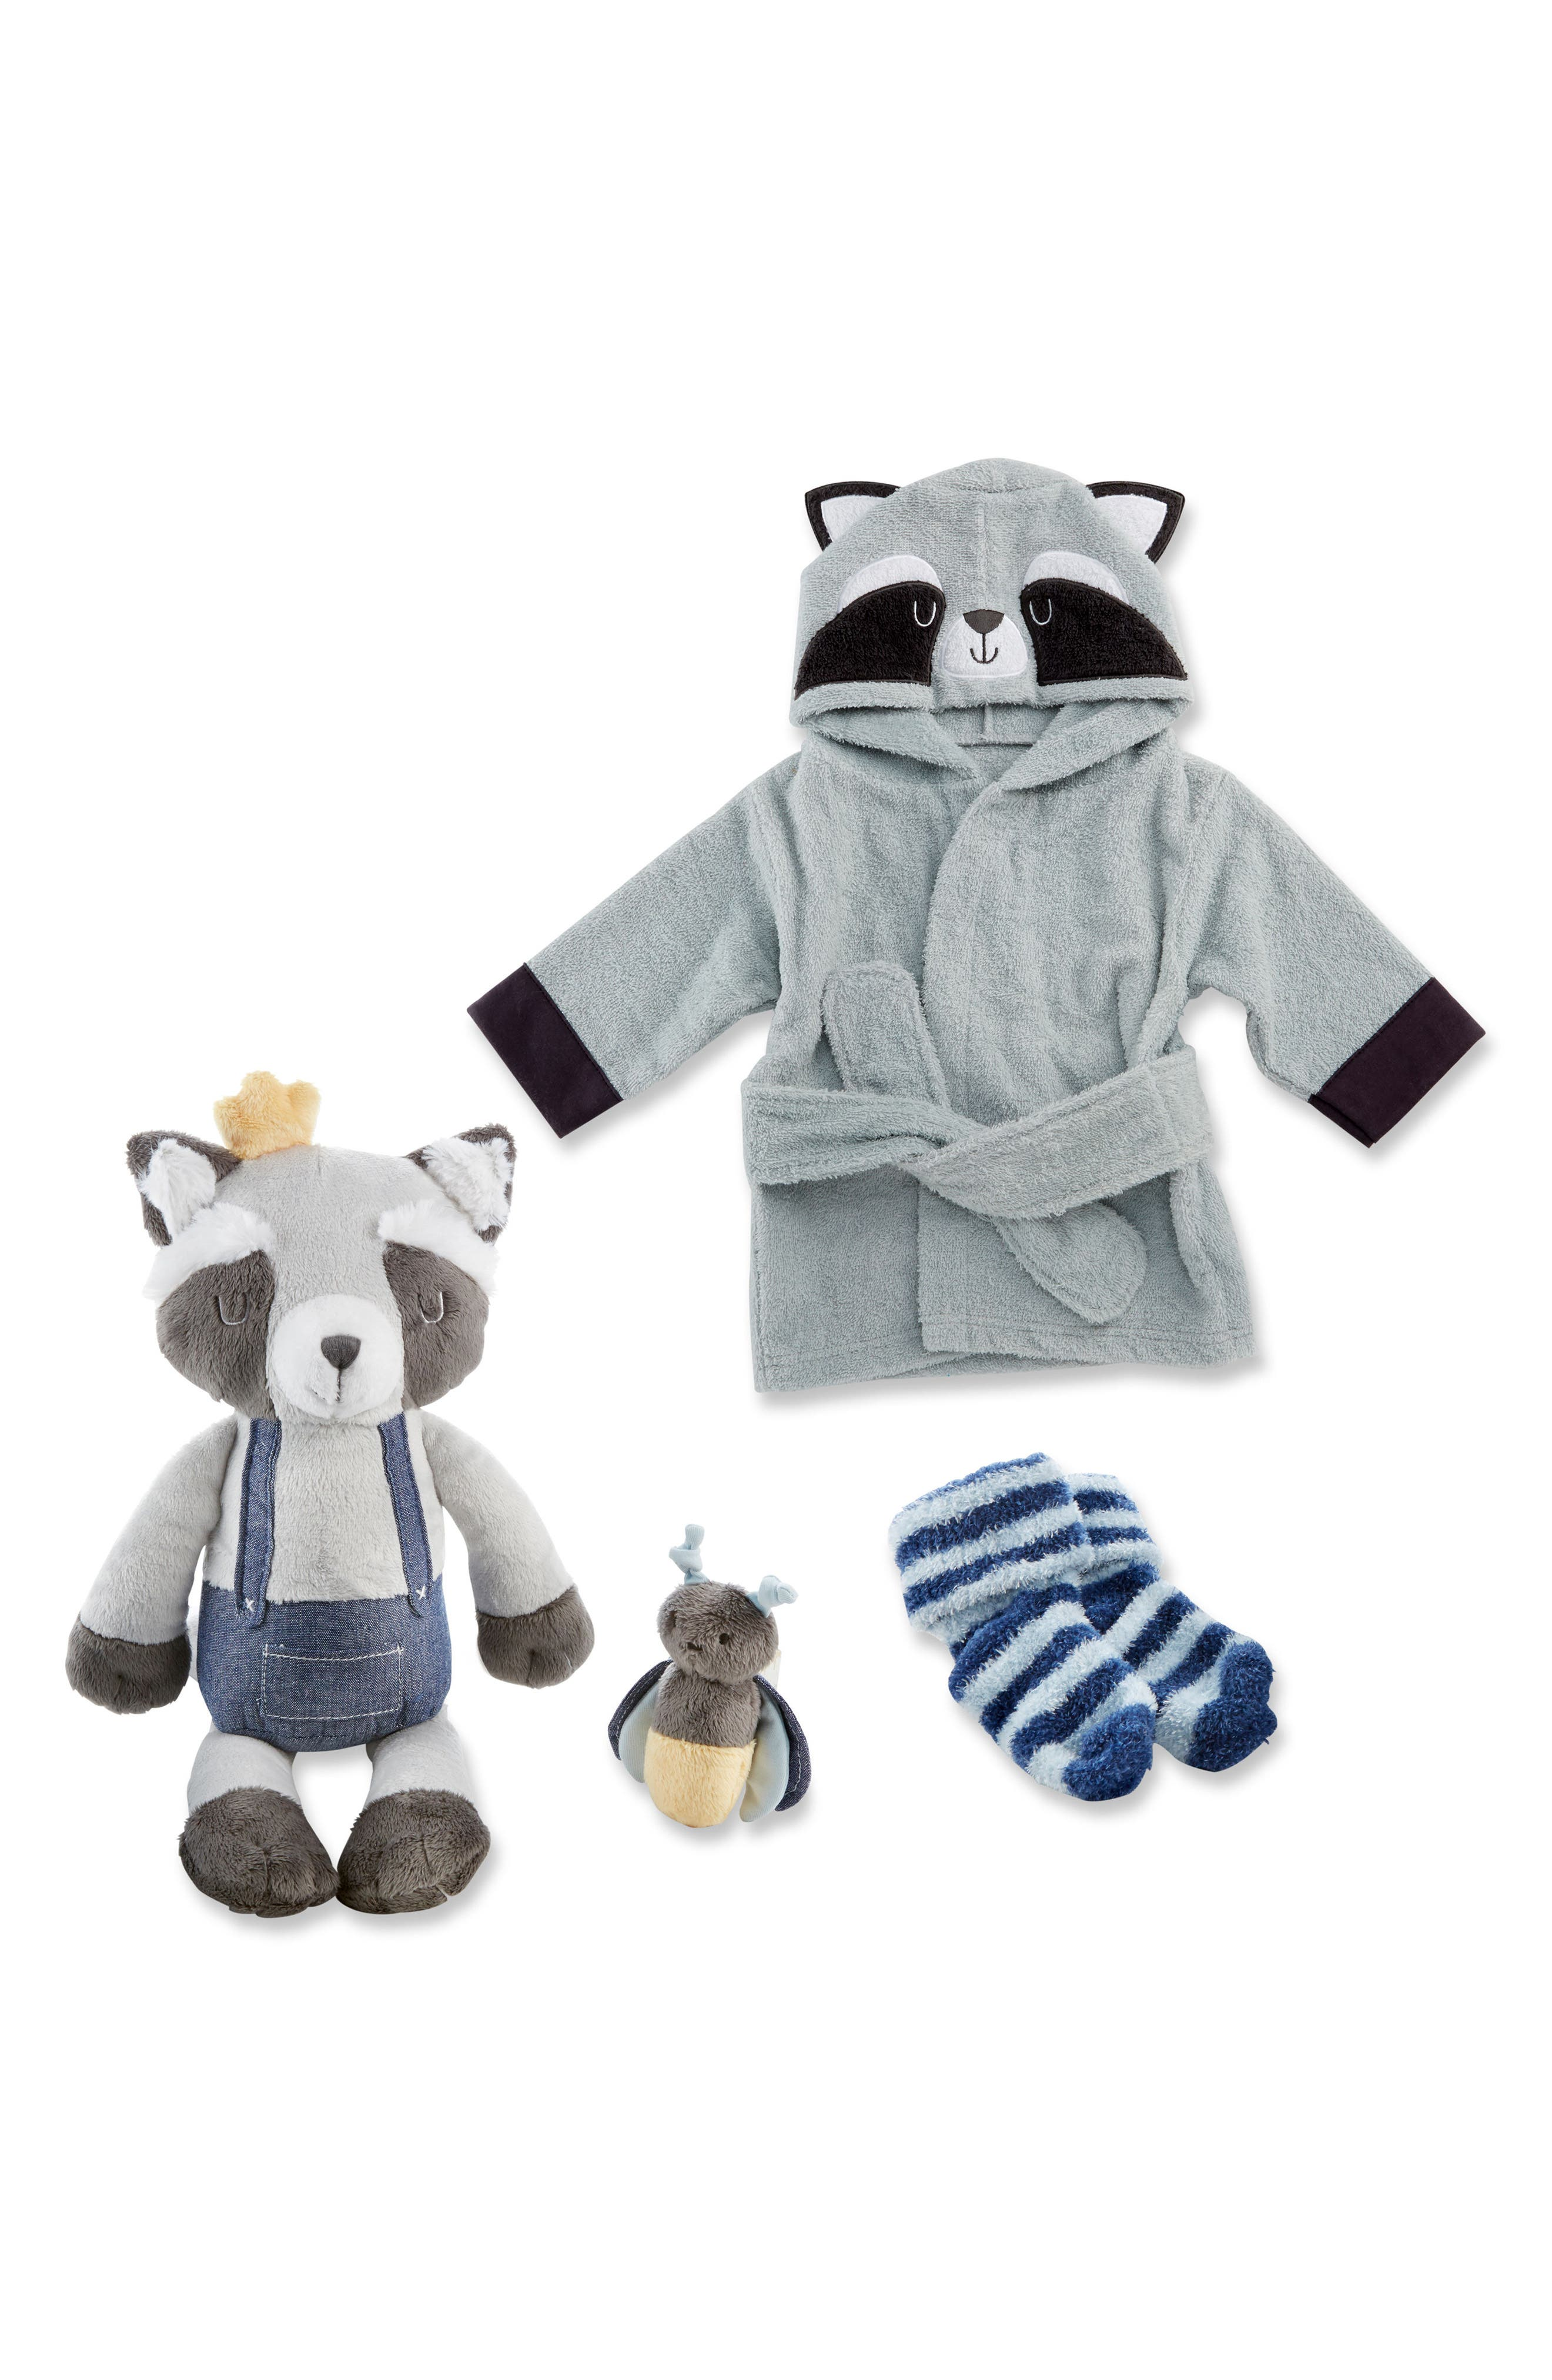 Alternate Image 1 Selected - Baby Aspen Forest Friends Raccoon Plush Robe, Fuzzy Socks, Stuffed Animal & Rattle Set (Baby)